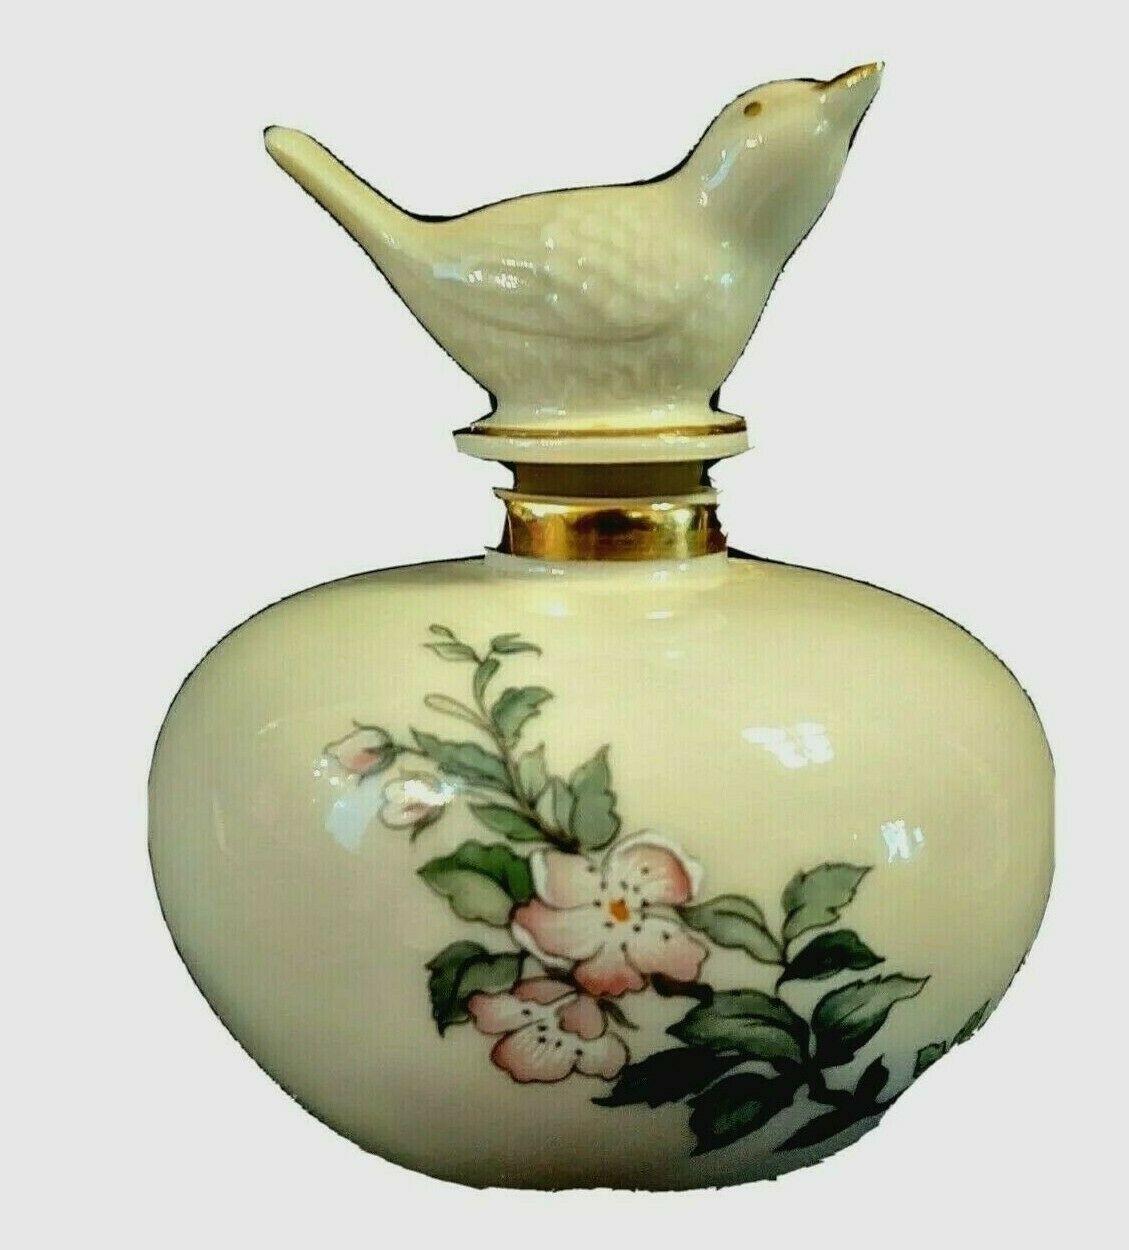 Lenox Serenade Perfume Bottle w/ Bird Stopper, Ivory Colored, Dogwood Pattern - $16.81